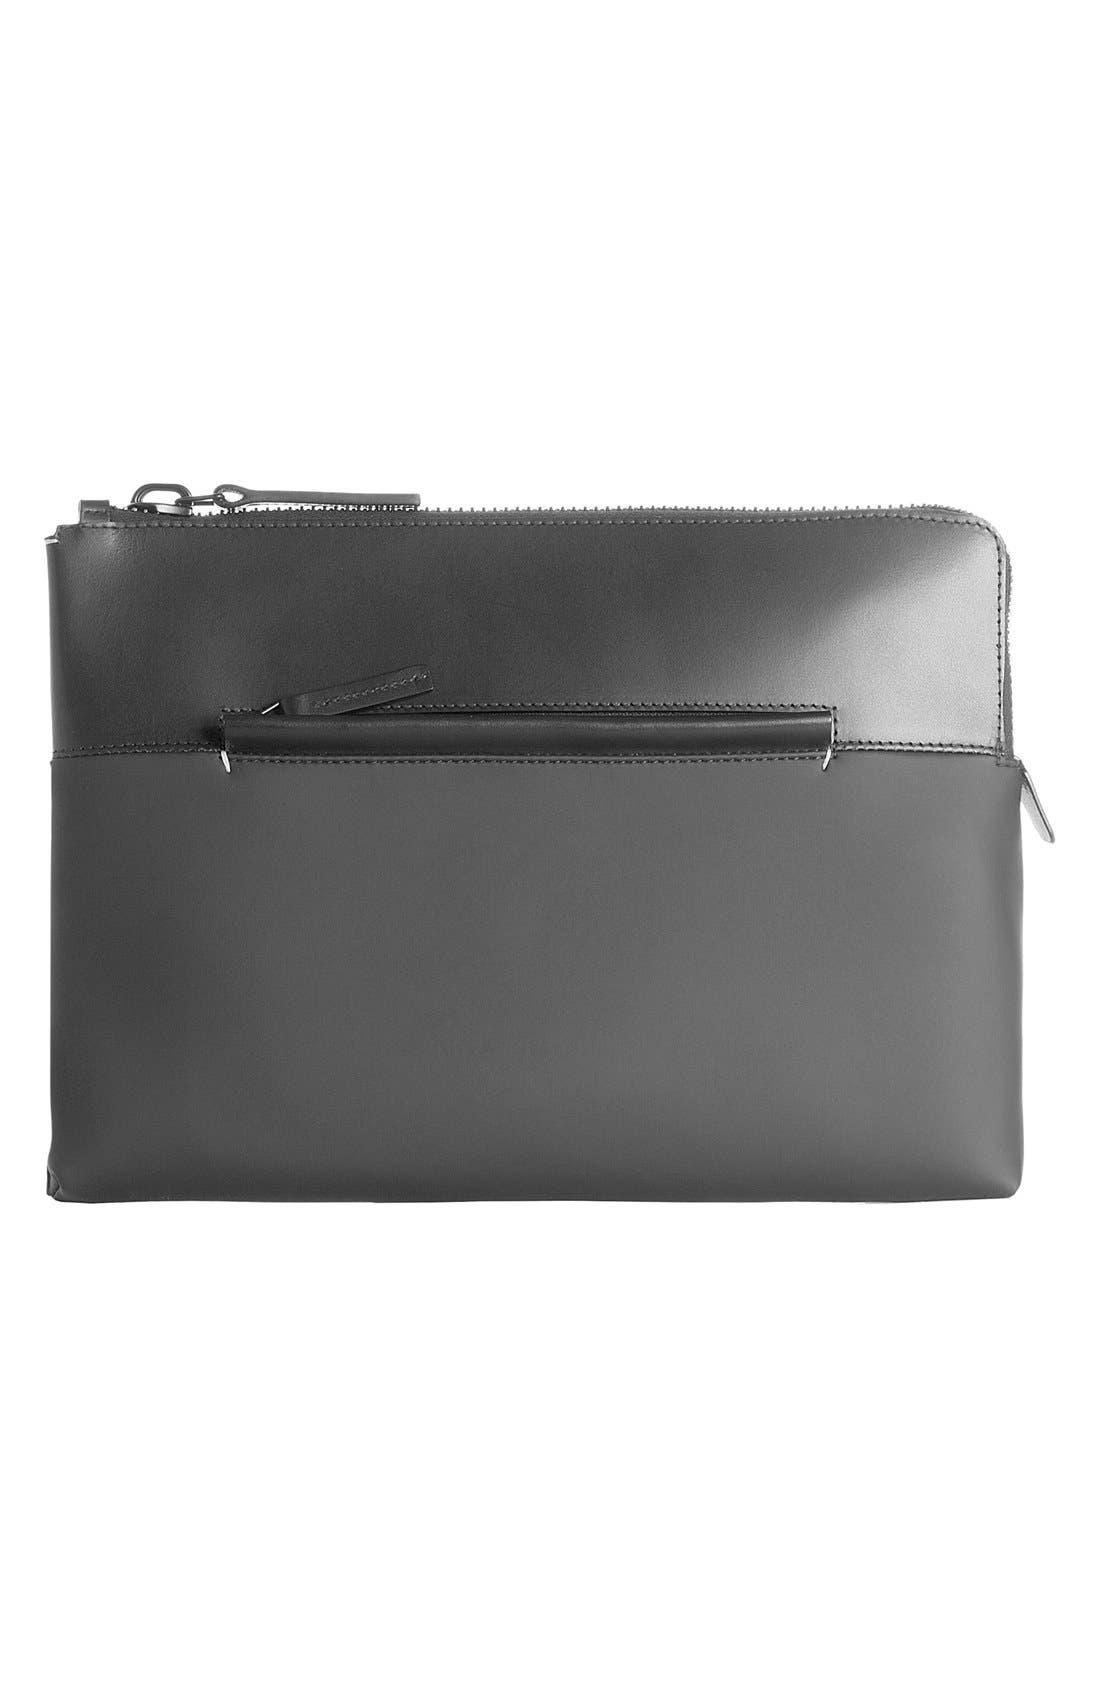 Alternate Image 1 Selected - Troubadour Rubber & Leather Portfolio Case